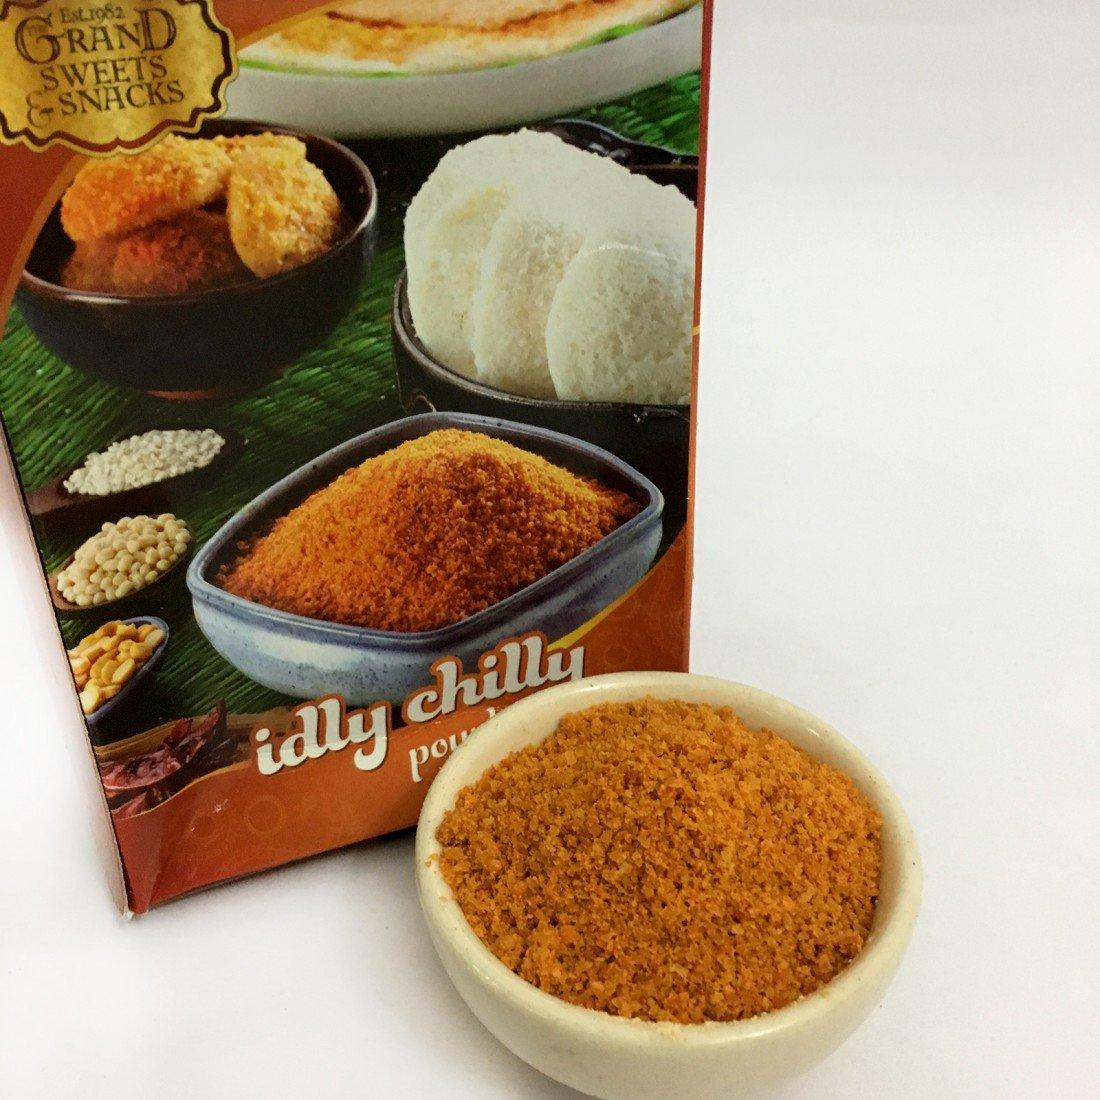 Max 74% OFF The Grand Sweets Chennai Idli Podi South Indian NEW Chilli Chutney